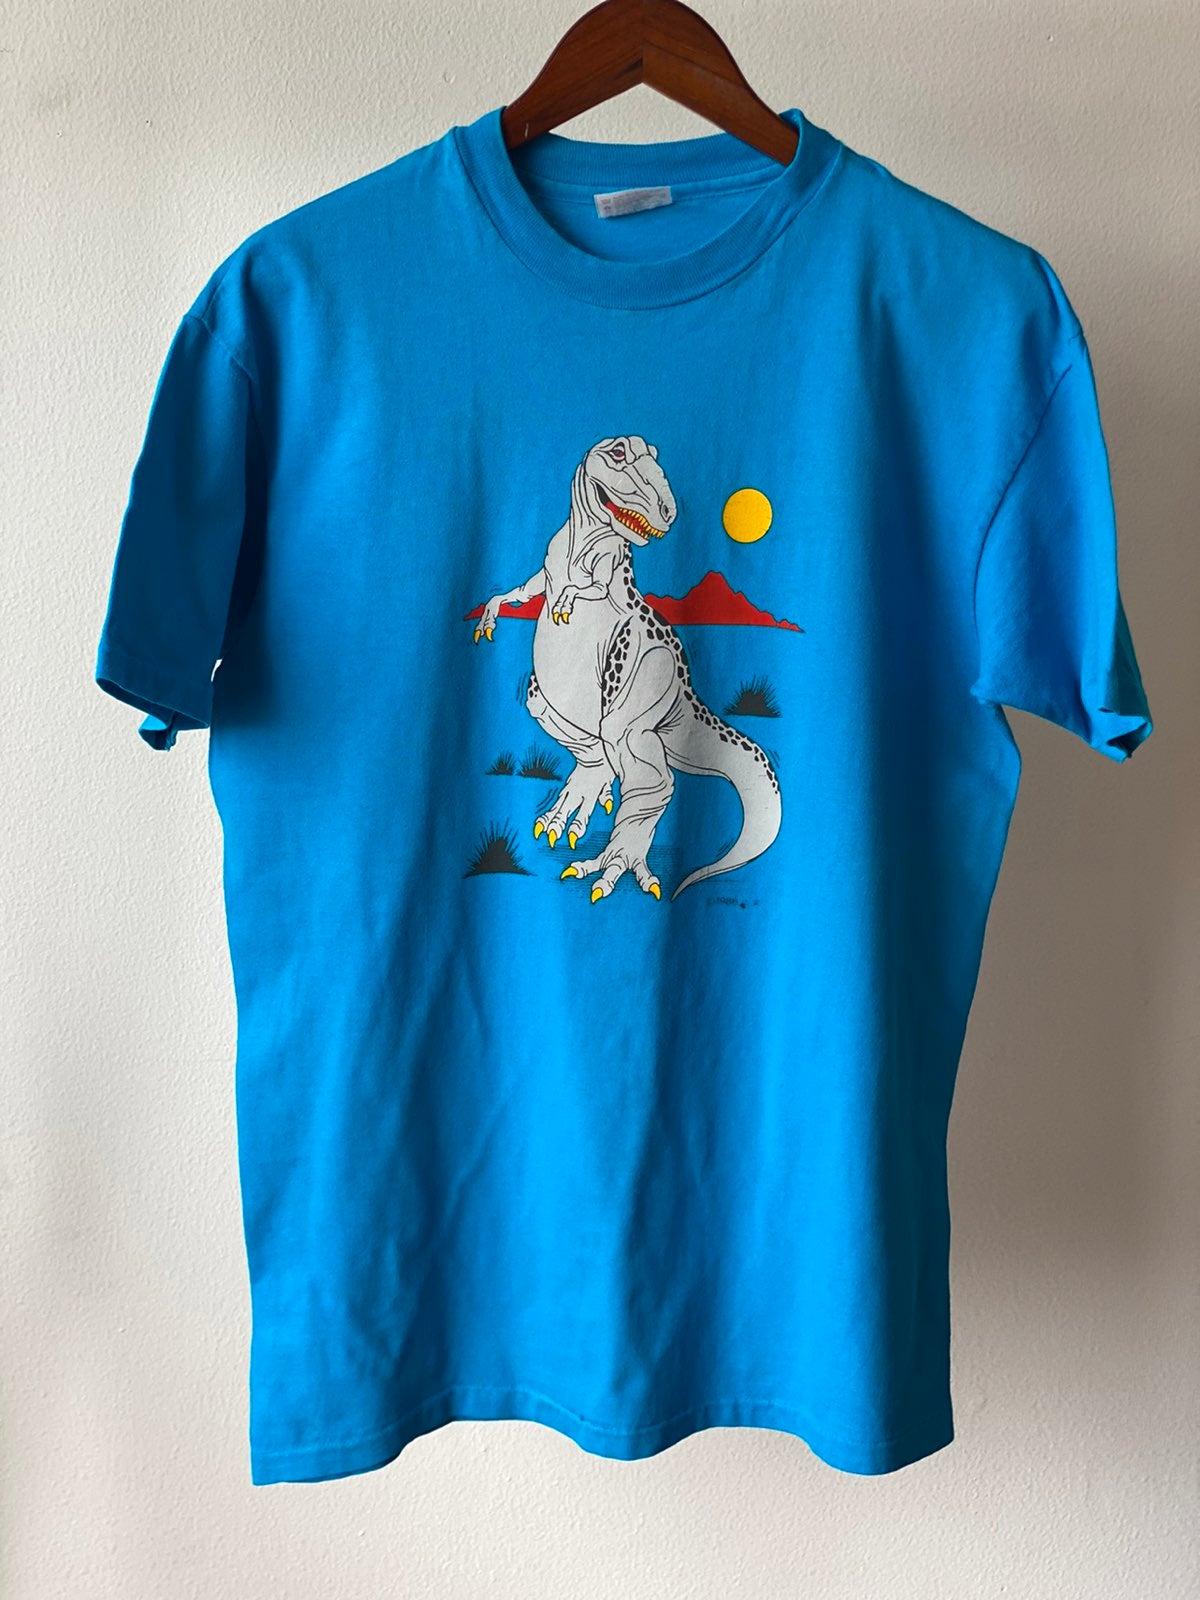 Vintage '86 T-Rex Shirt Sz L